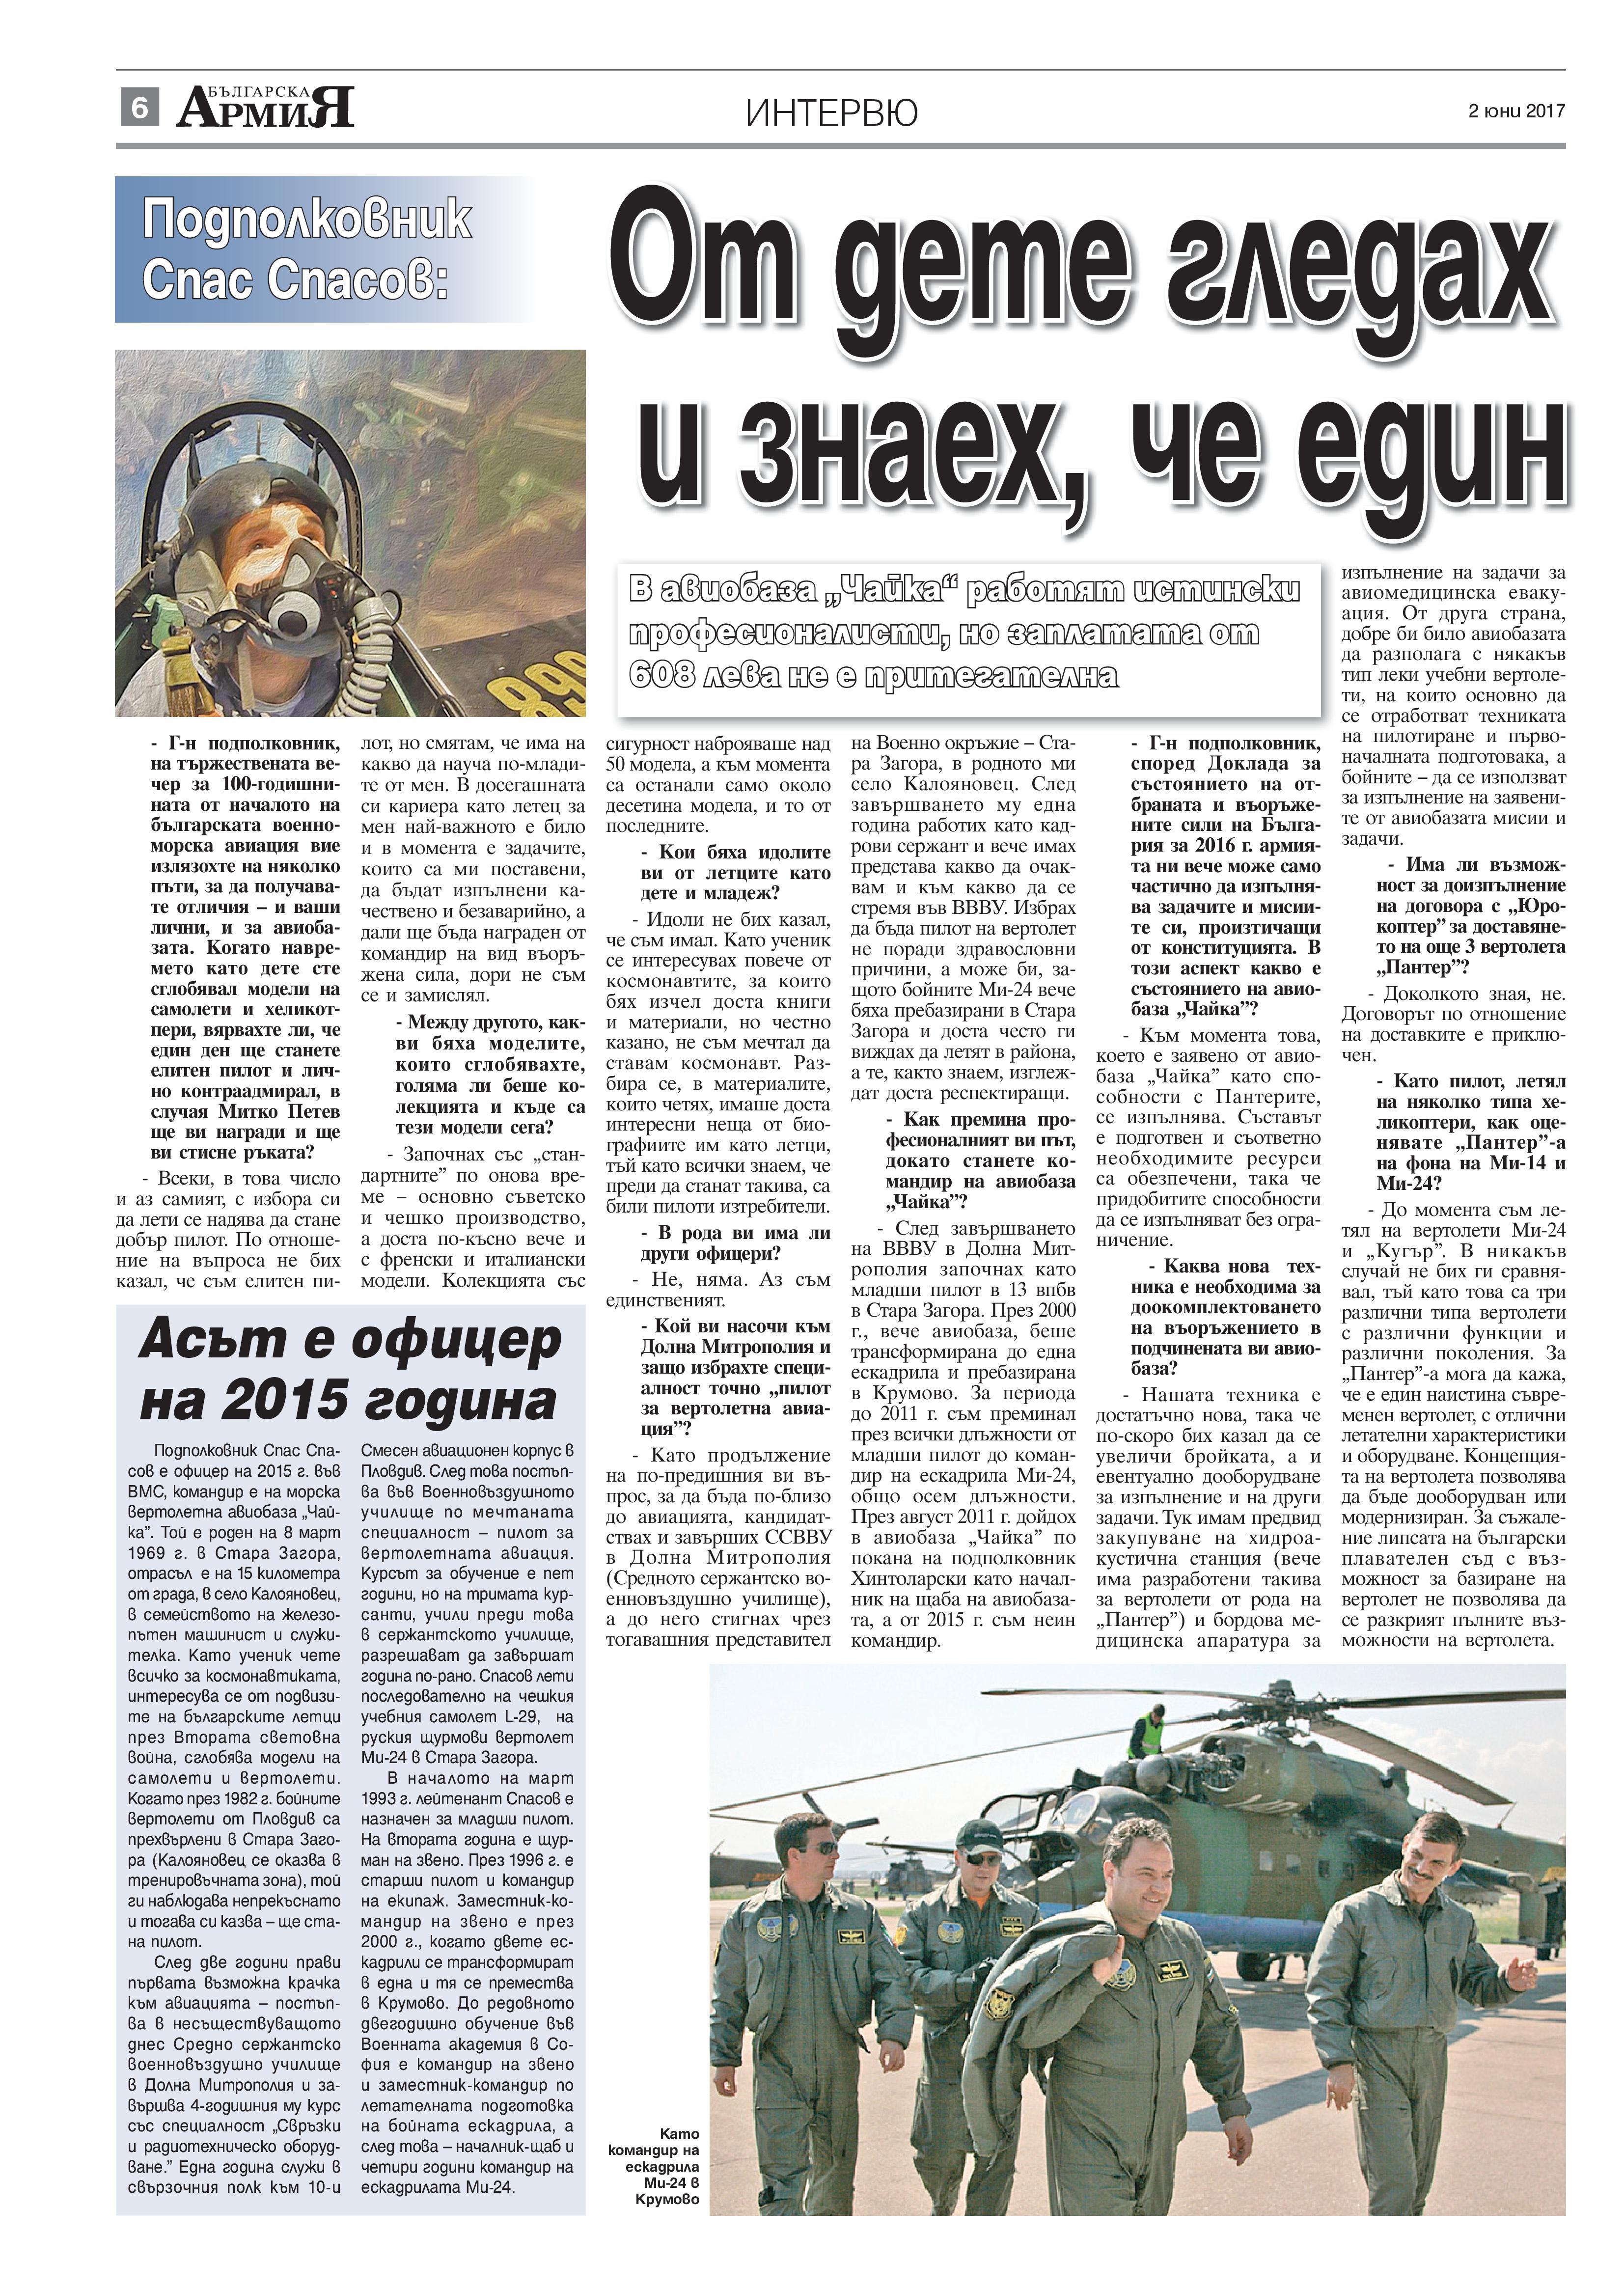 https://www.armymedia.bg/wp-content/uploads/2015/06/06-5.jpg